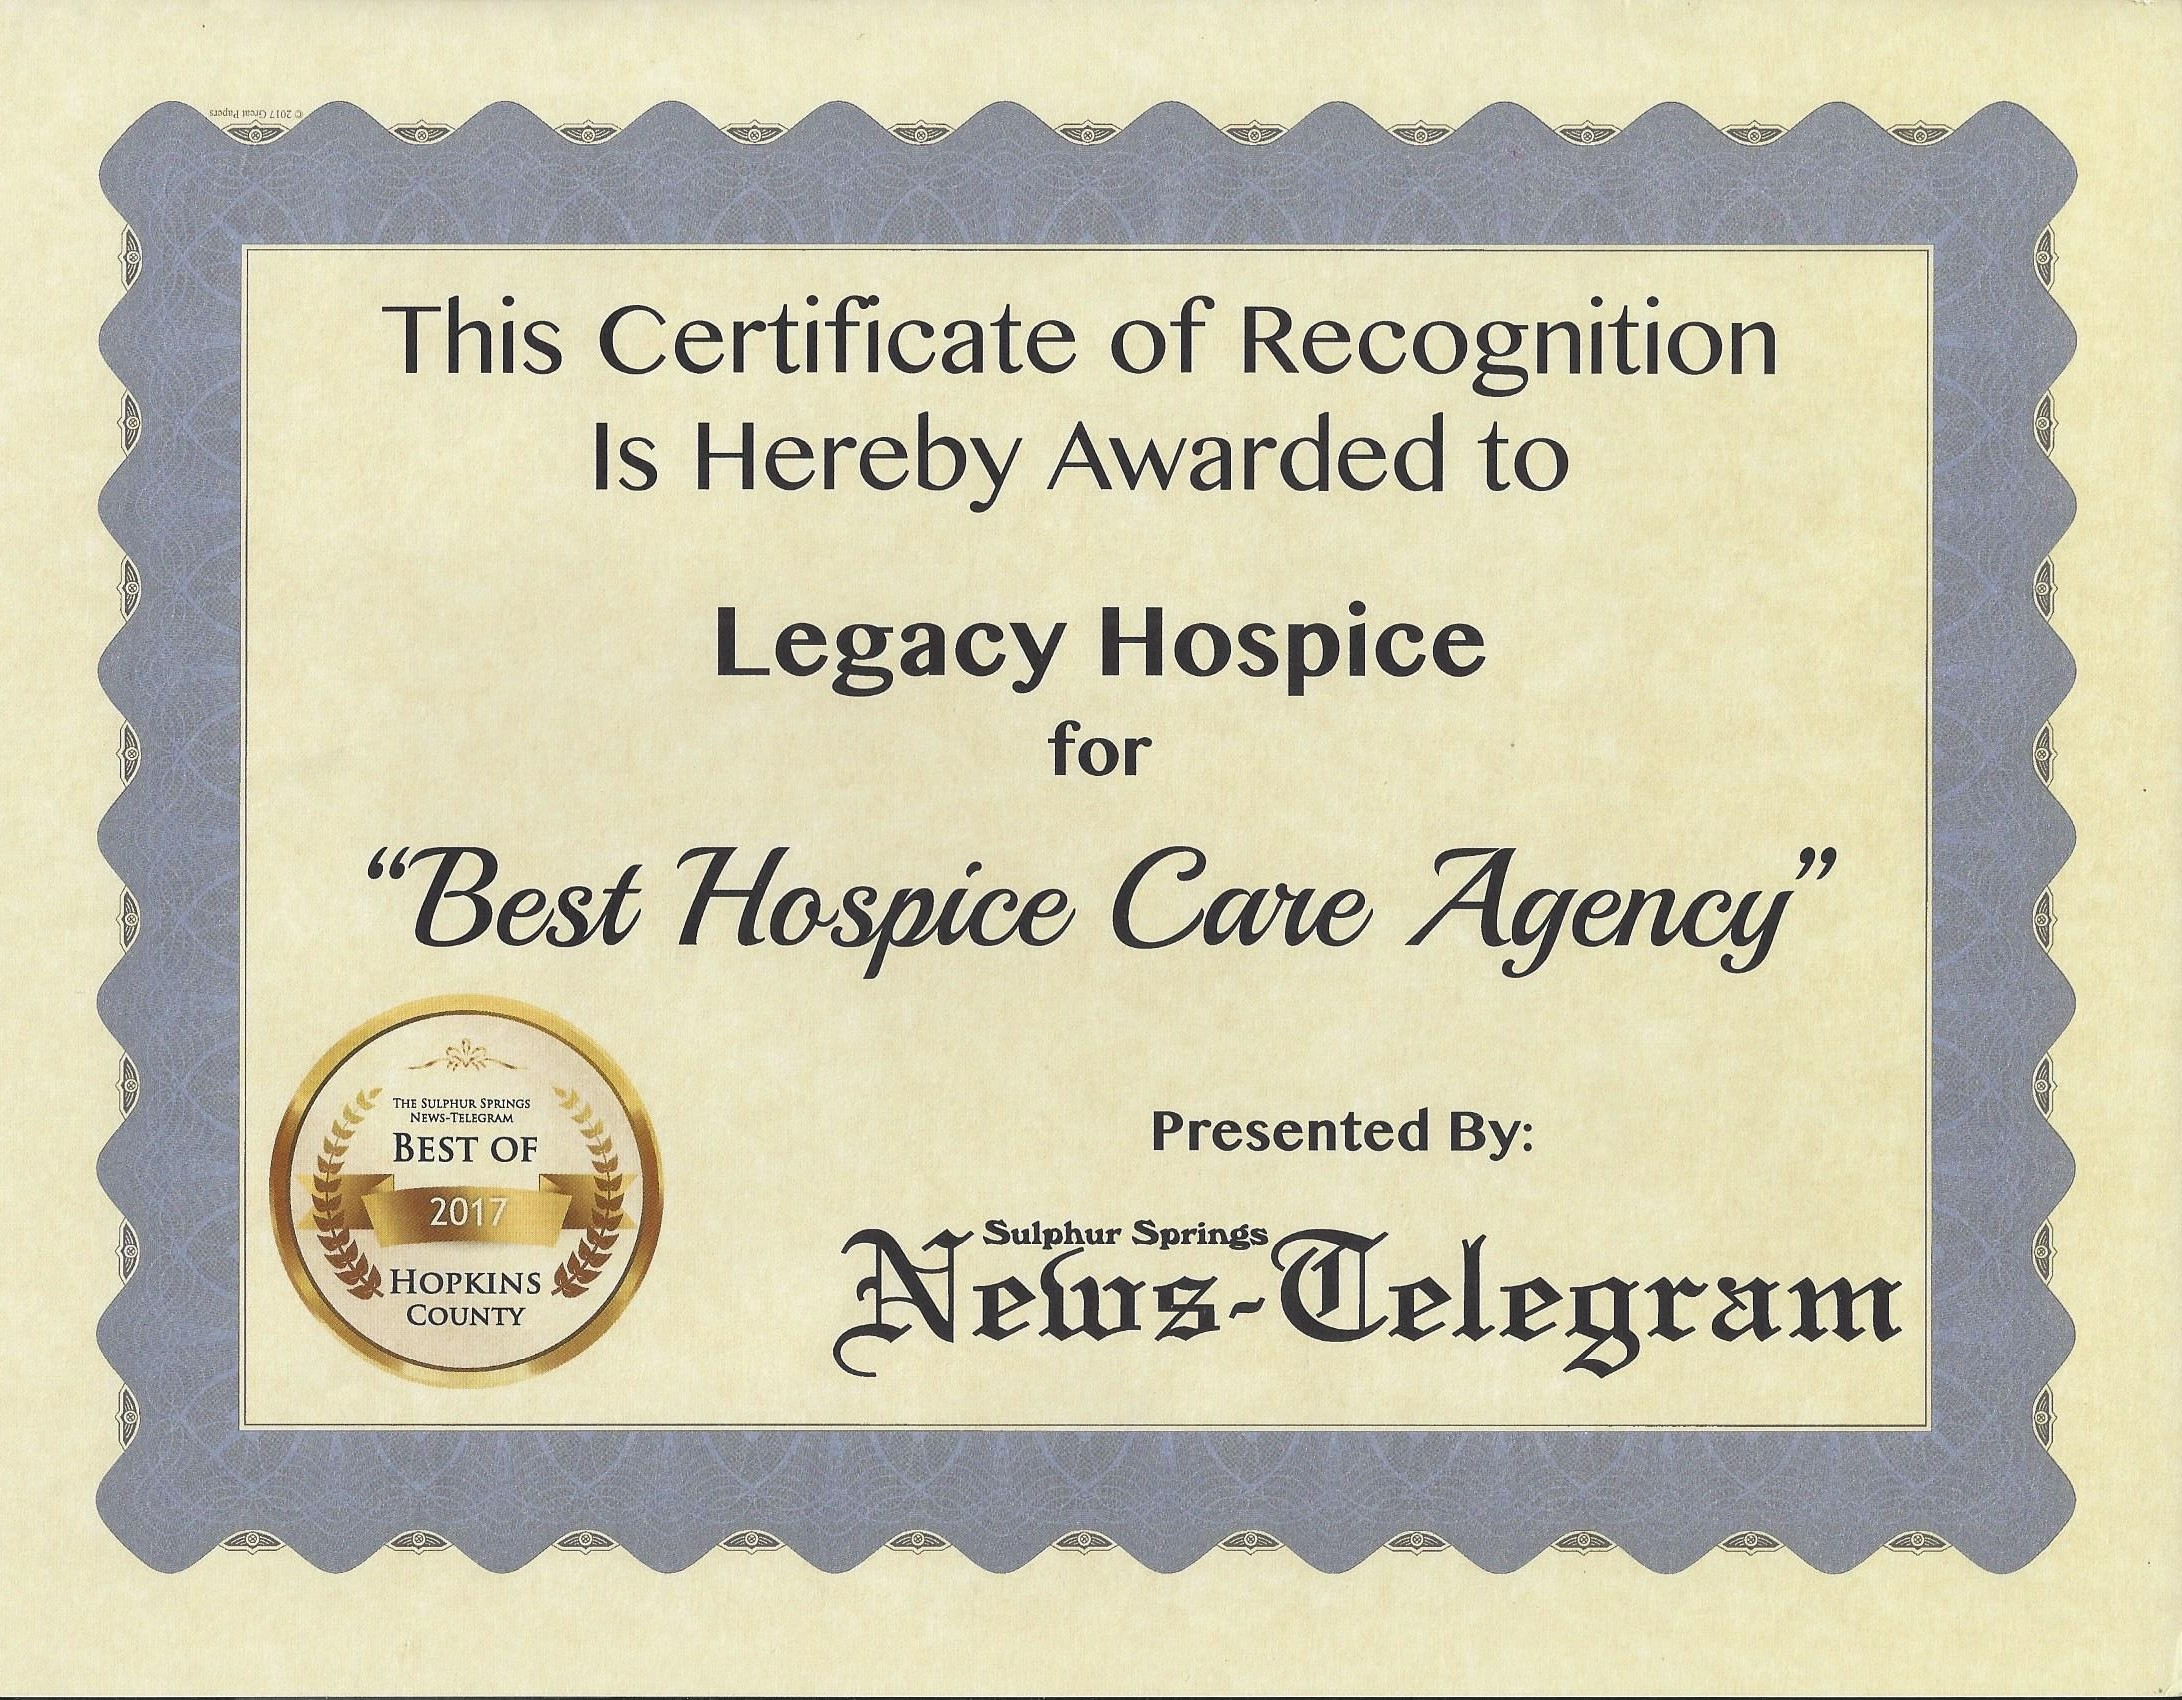 BEST HOSPICE CARE AGENCY 2017.jpg